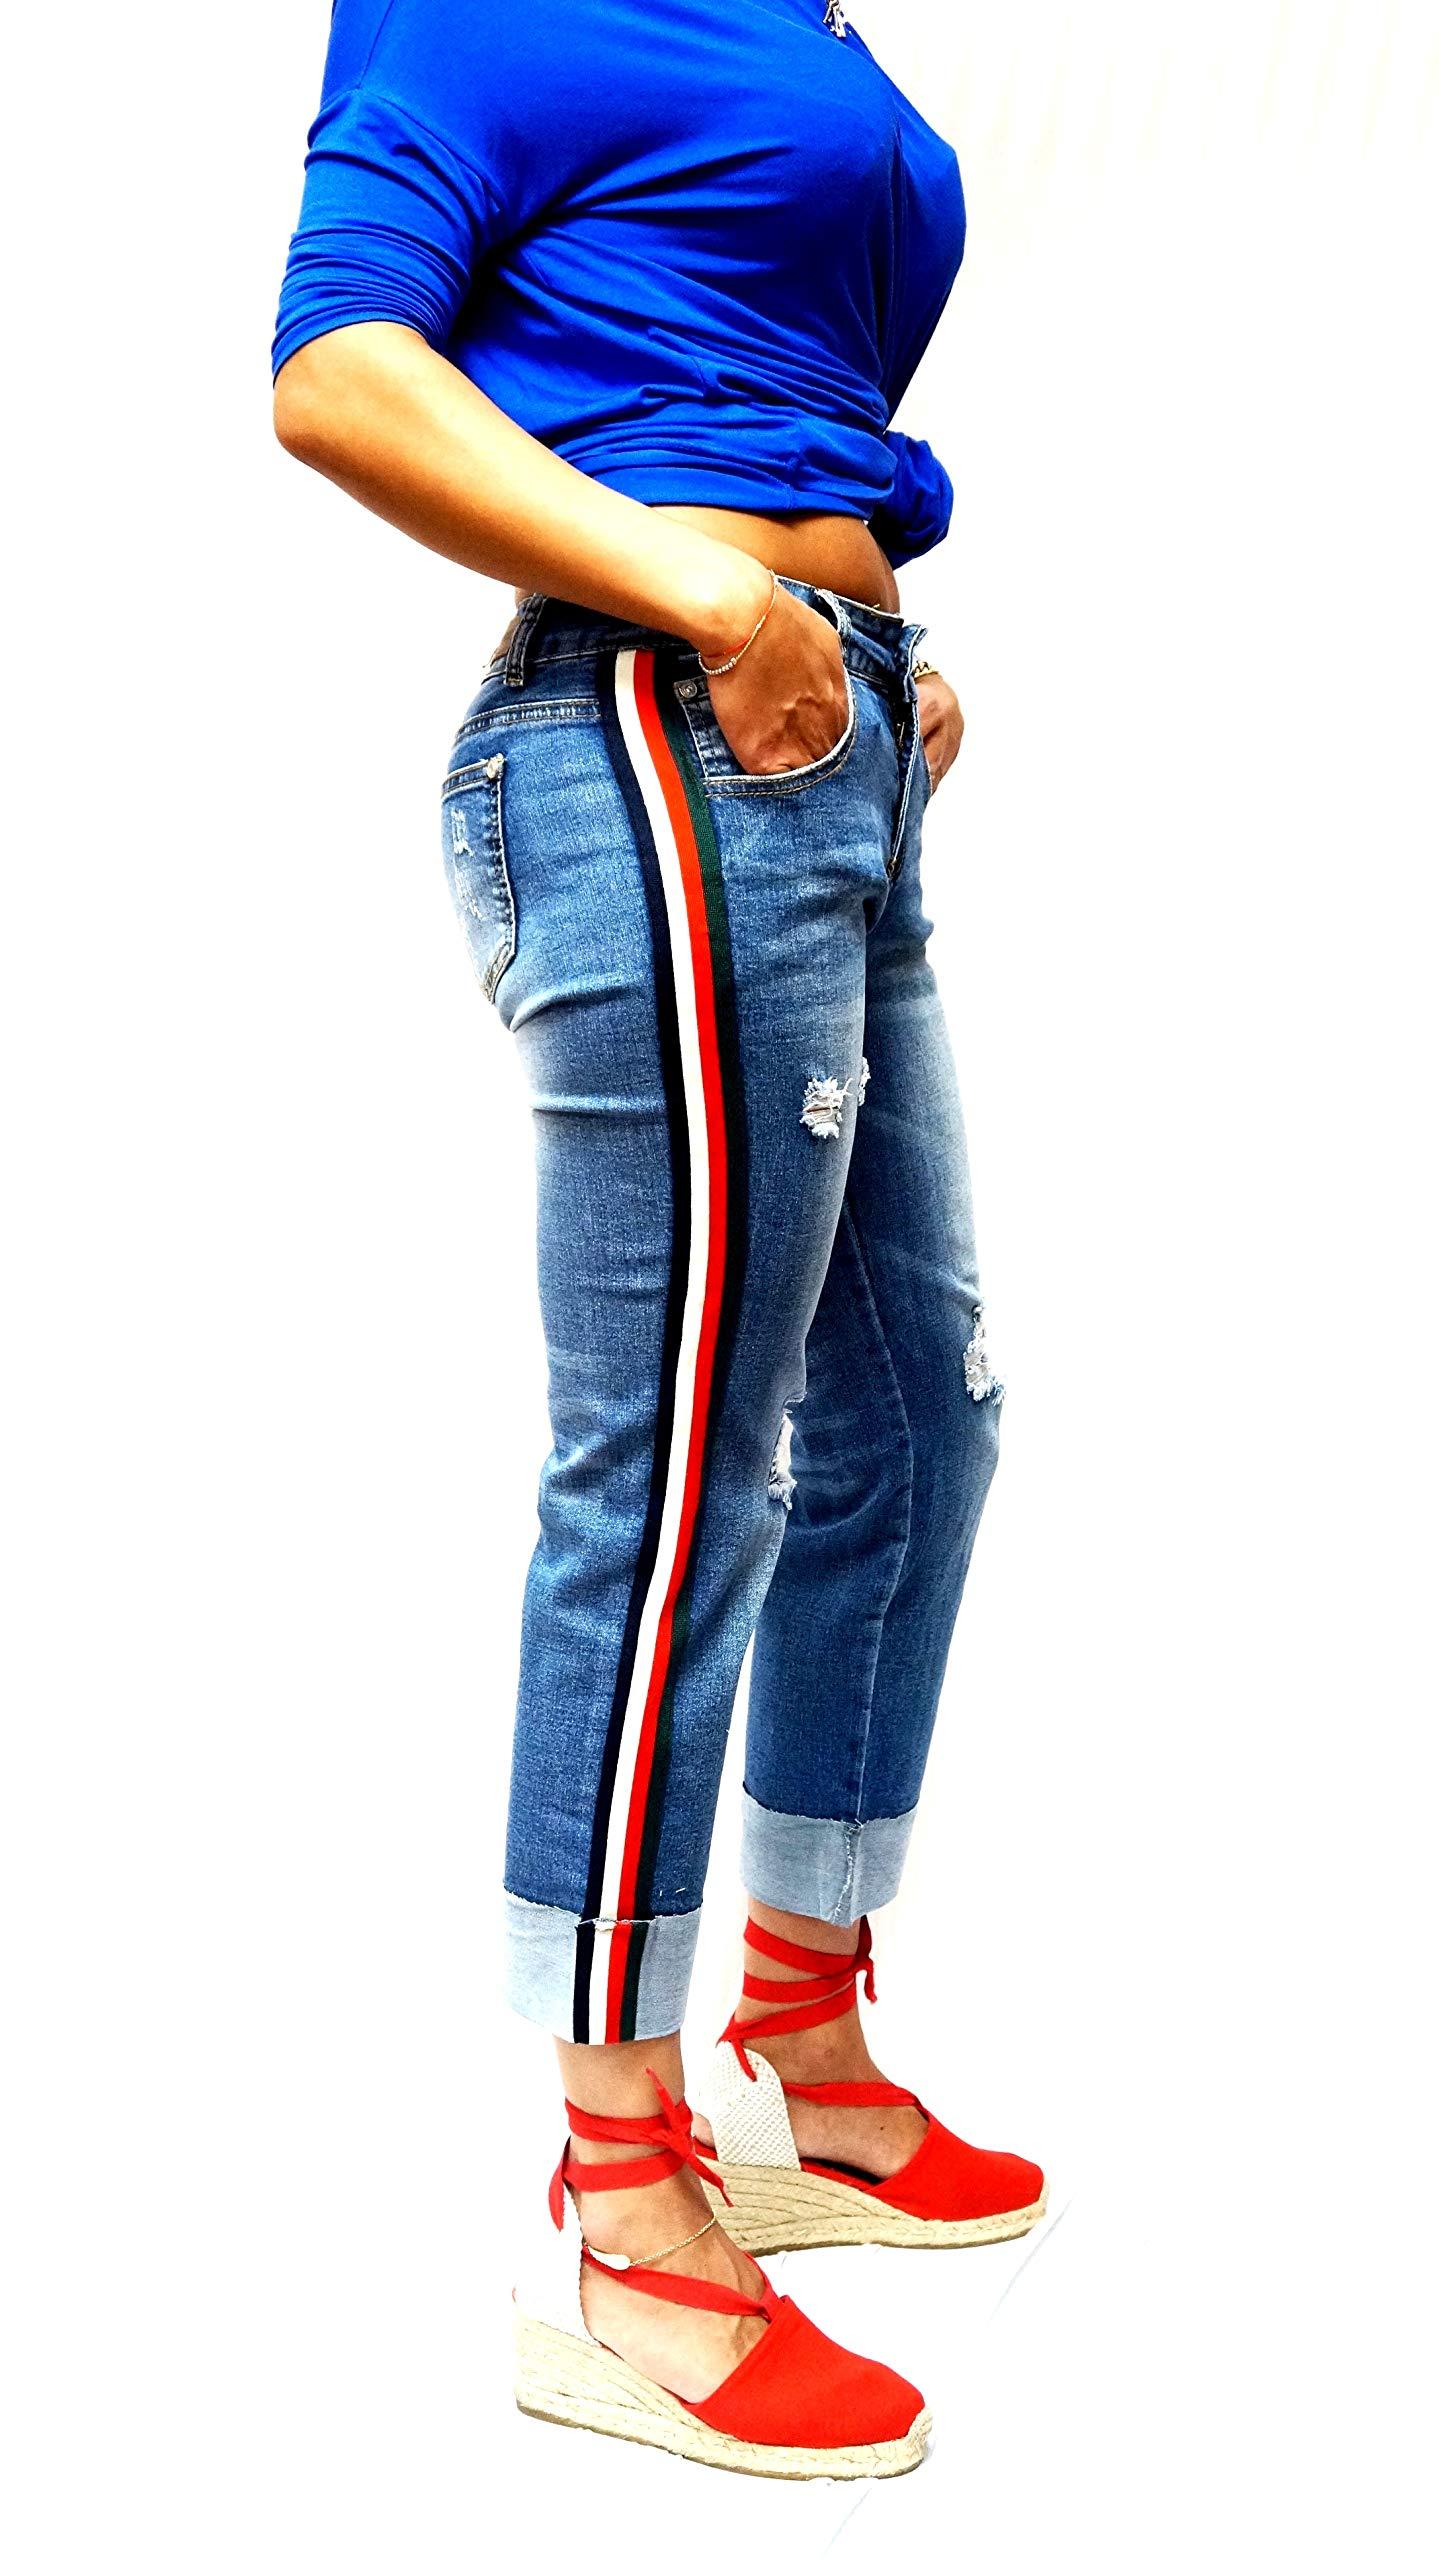 SS-Look Side Stripe Jeans Women Casual Ripped Distressed Boyfriend Jeans Pants Roll Cuff Loose Straight Wide Leg Denim Jeans Trousers (Blue C-A10553, 17)